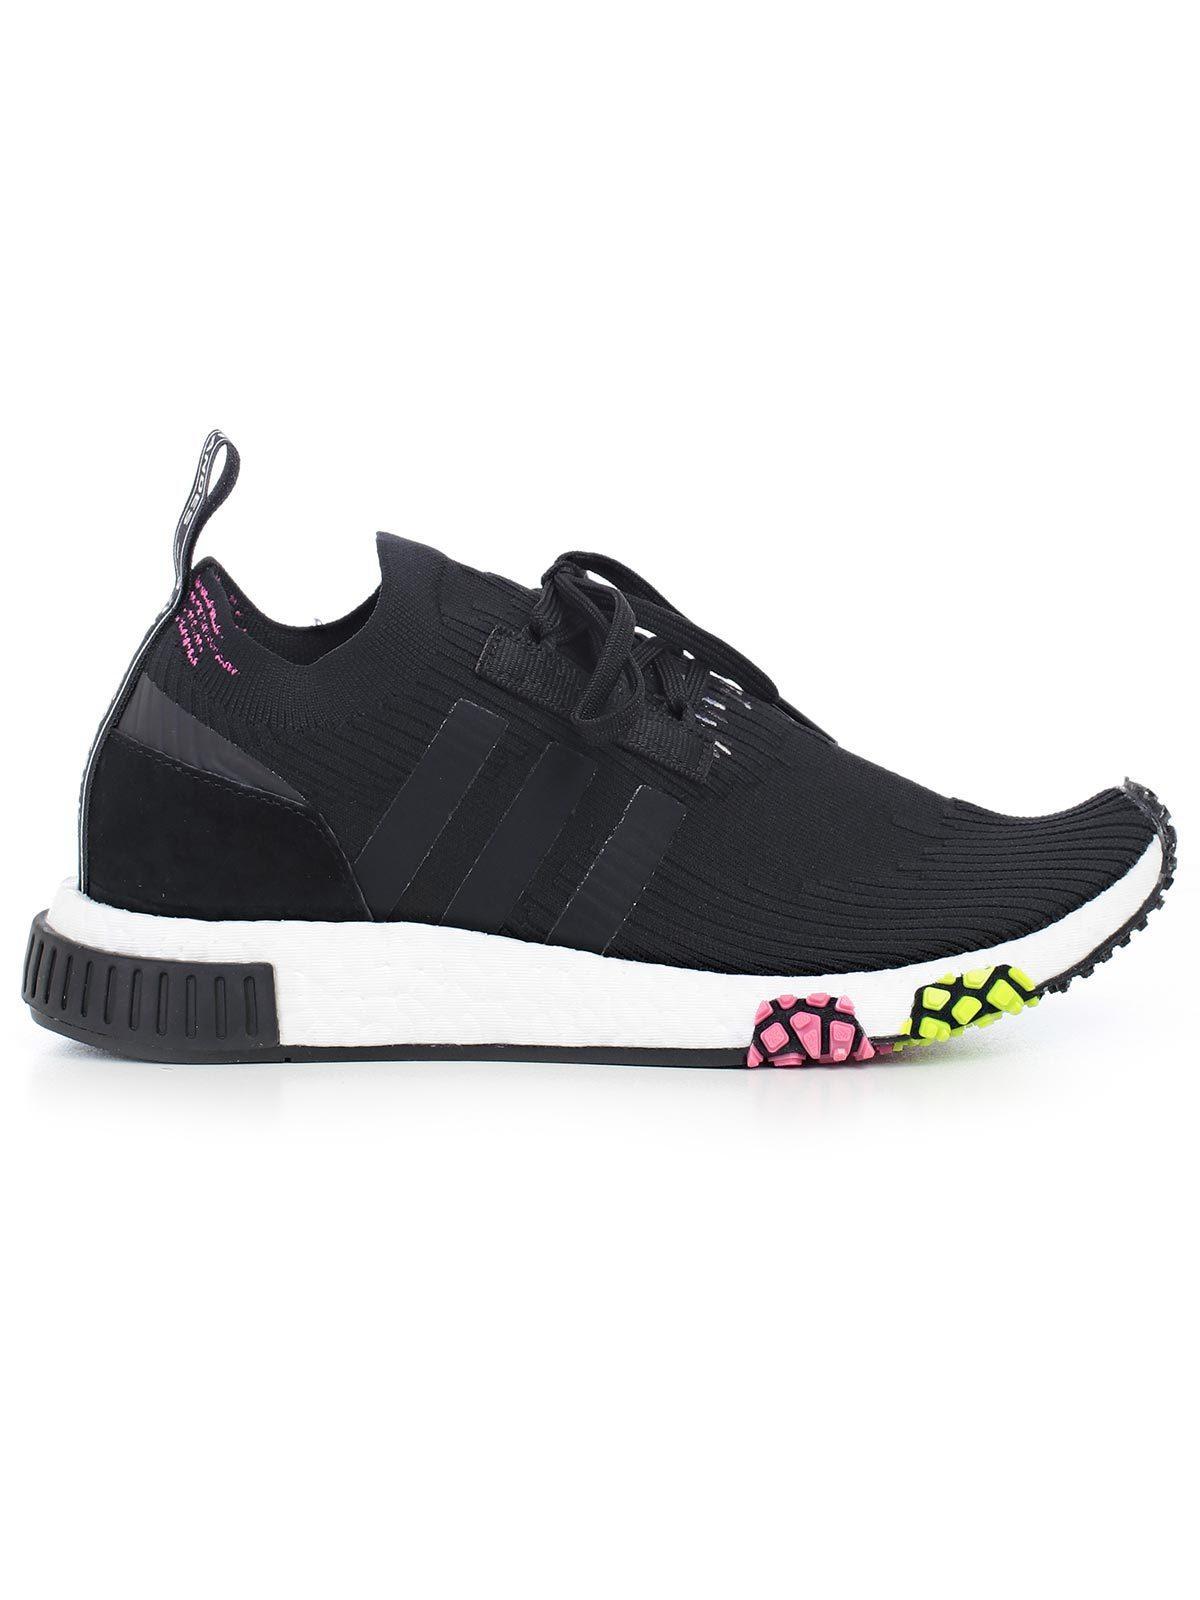 da3cf0a4b4c2b Adidas Originals Nmd Racer Primeknit Sneakers In Black Cq2441 - Black